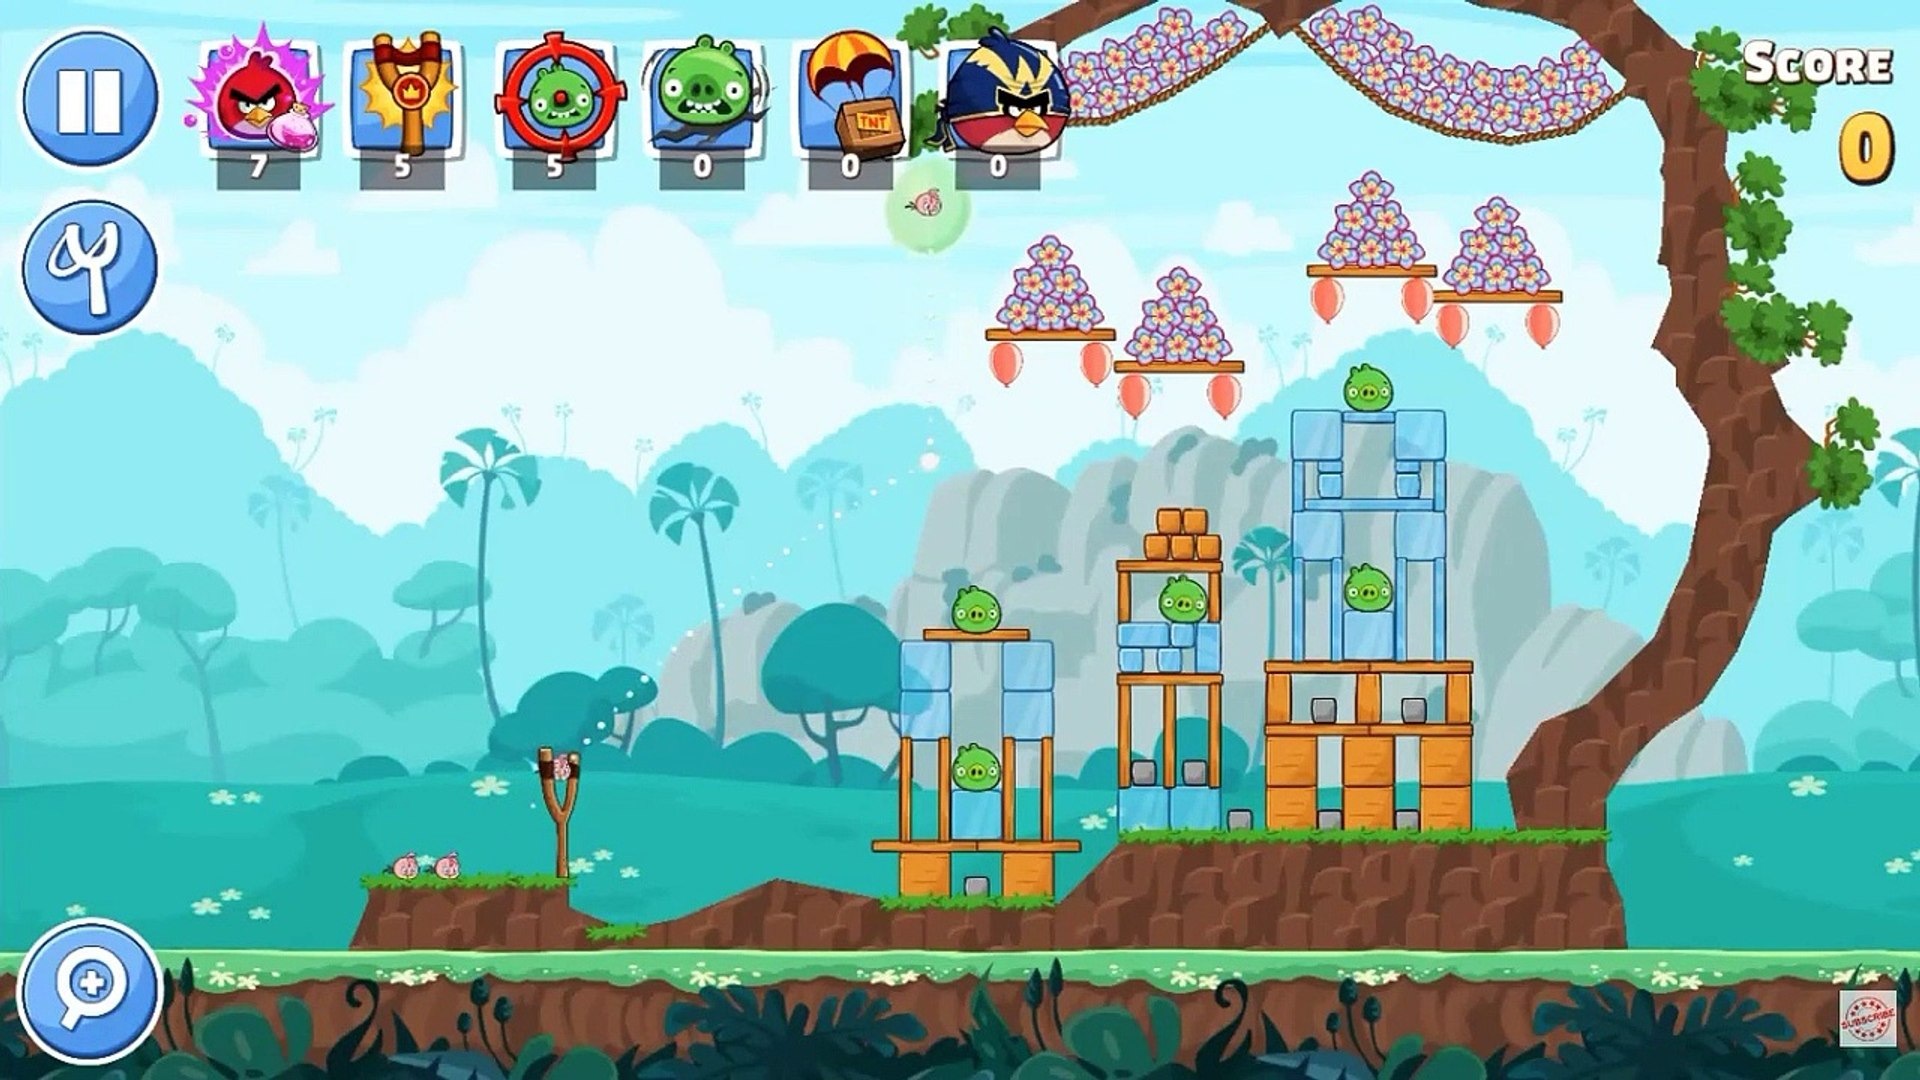 Angry Birds Friends - Gameplay Walkthrough part 1 - Angry Birds Friends - Procédure pas à pas de gam